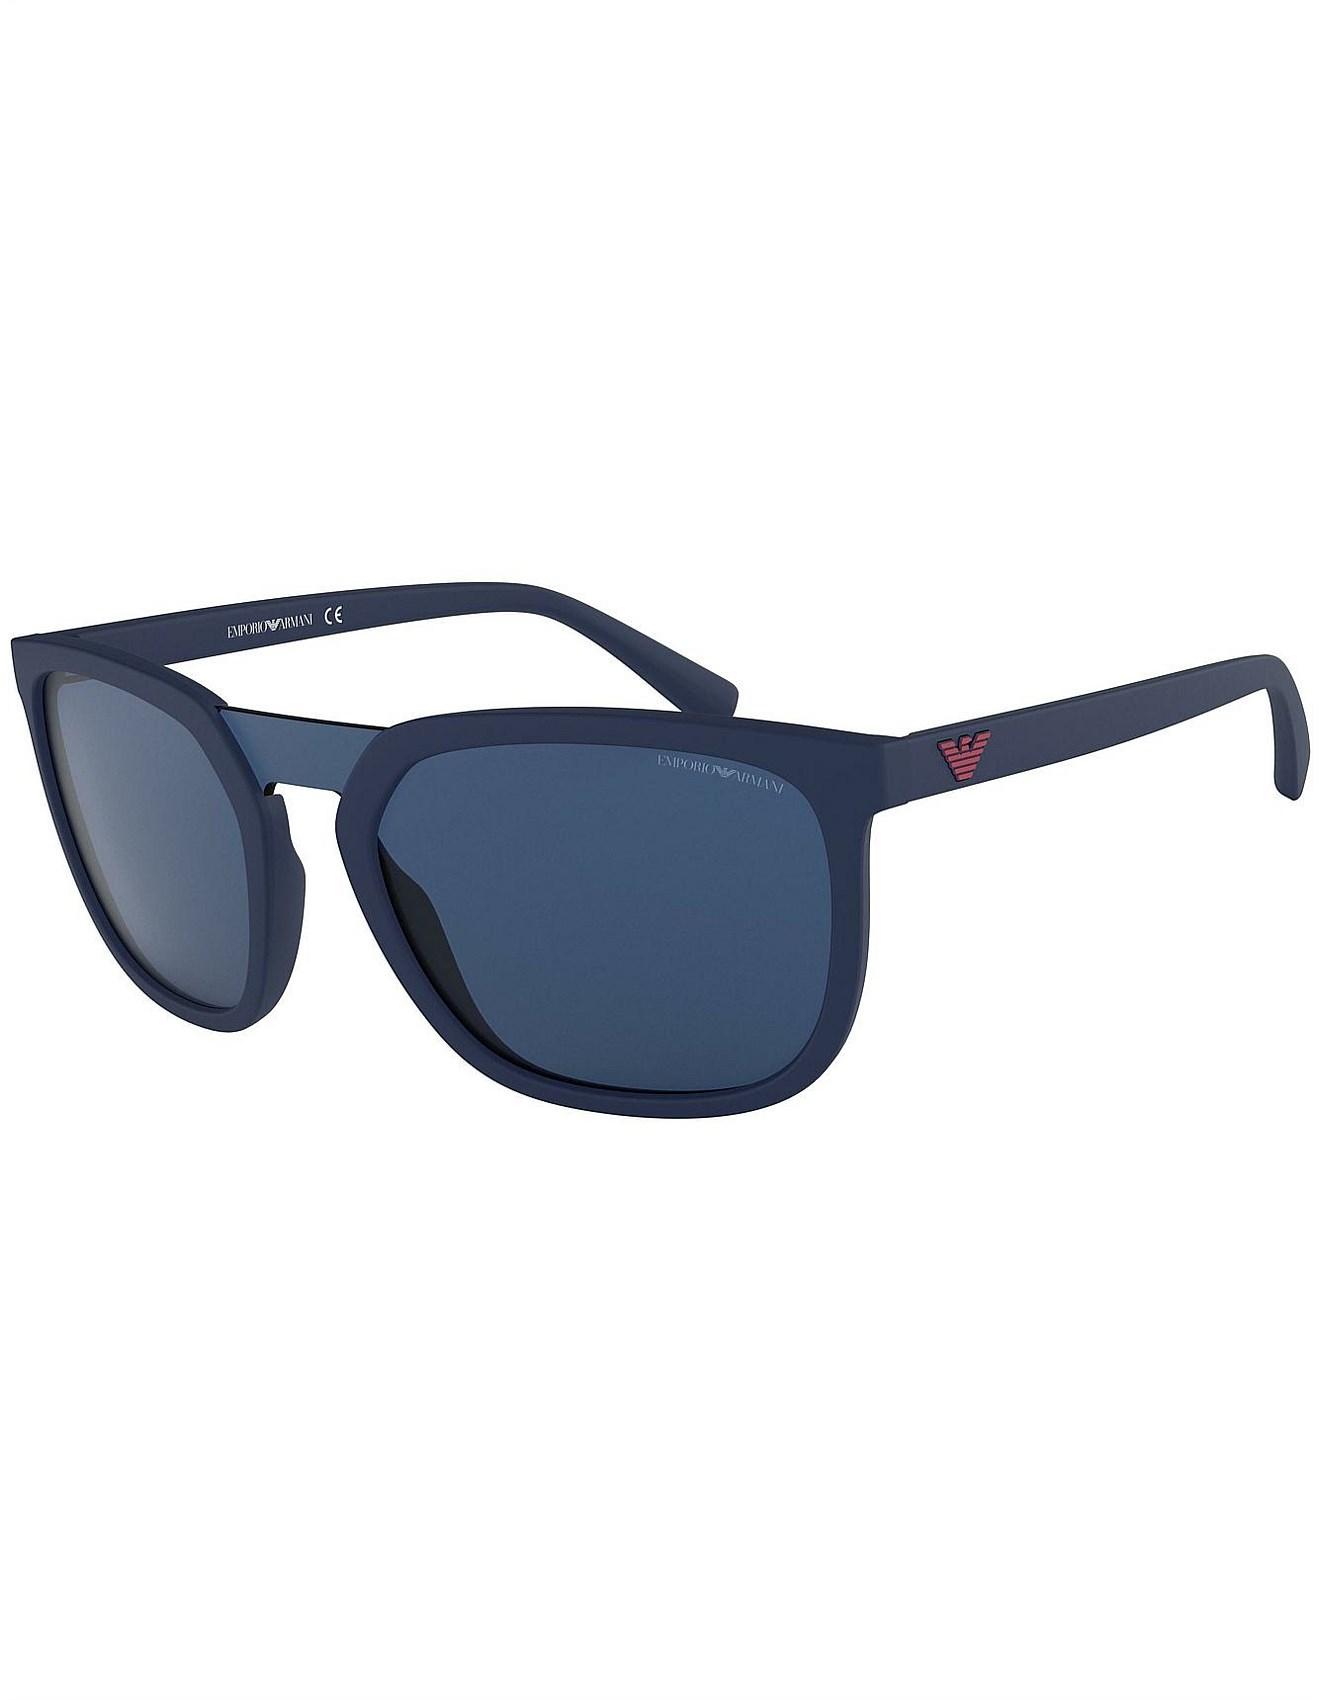 569ff9a4477b Women - Square Sunglasses